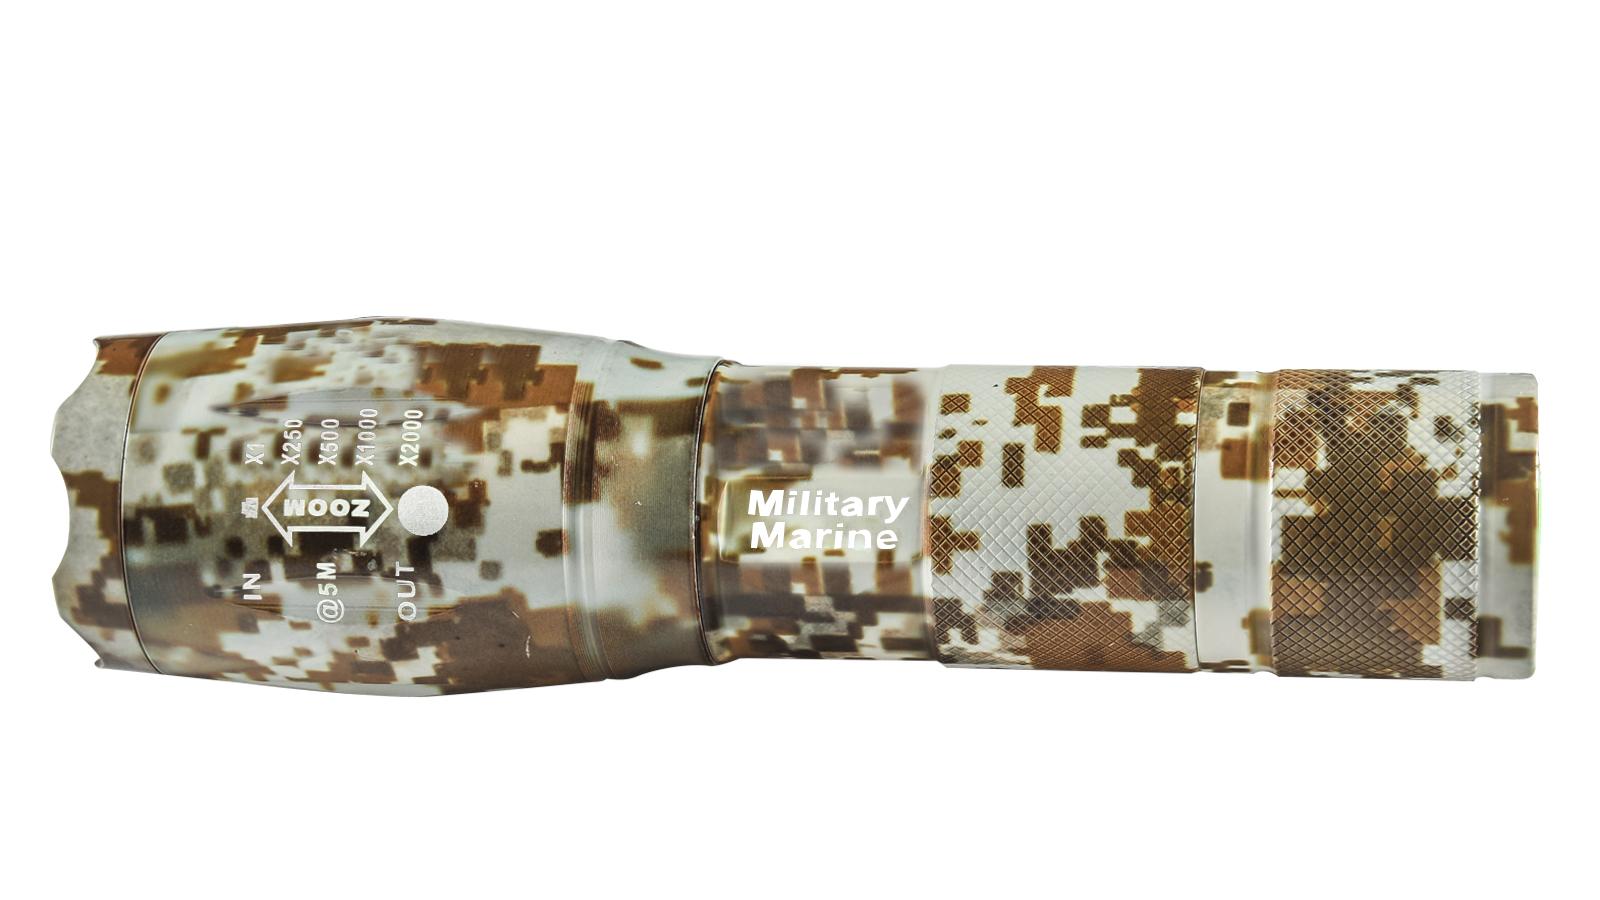 Фонарик выживания Military Marine 8000Lm T6